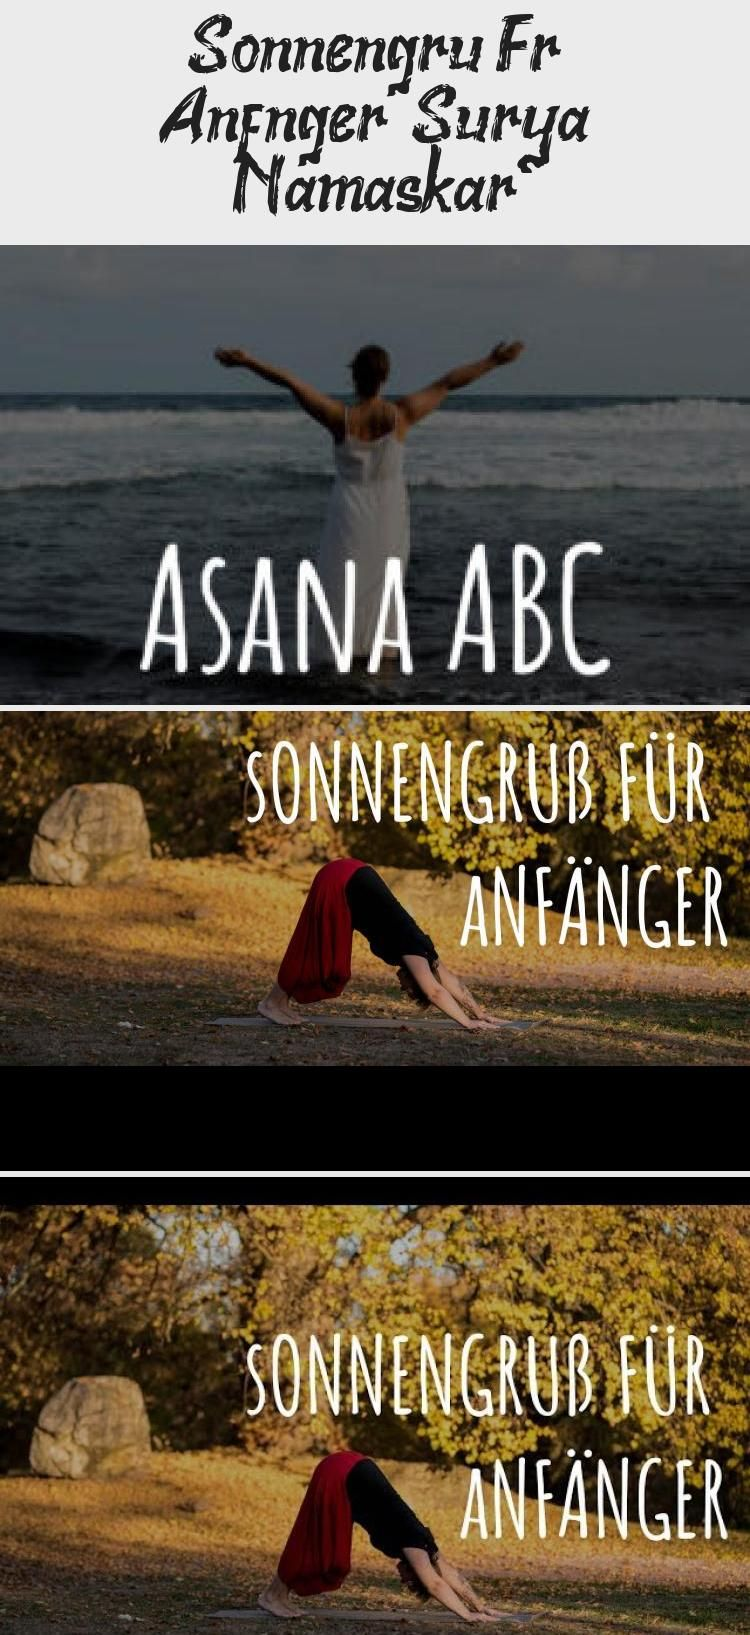 Sonnengruss Fur Anfanger Detailierte Anleitung Video Yoga Video Youtube Surya Namaskar A Yogastyle Hathayoga Yogafotos Yogaf Surya Namaskar Yoga Surya